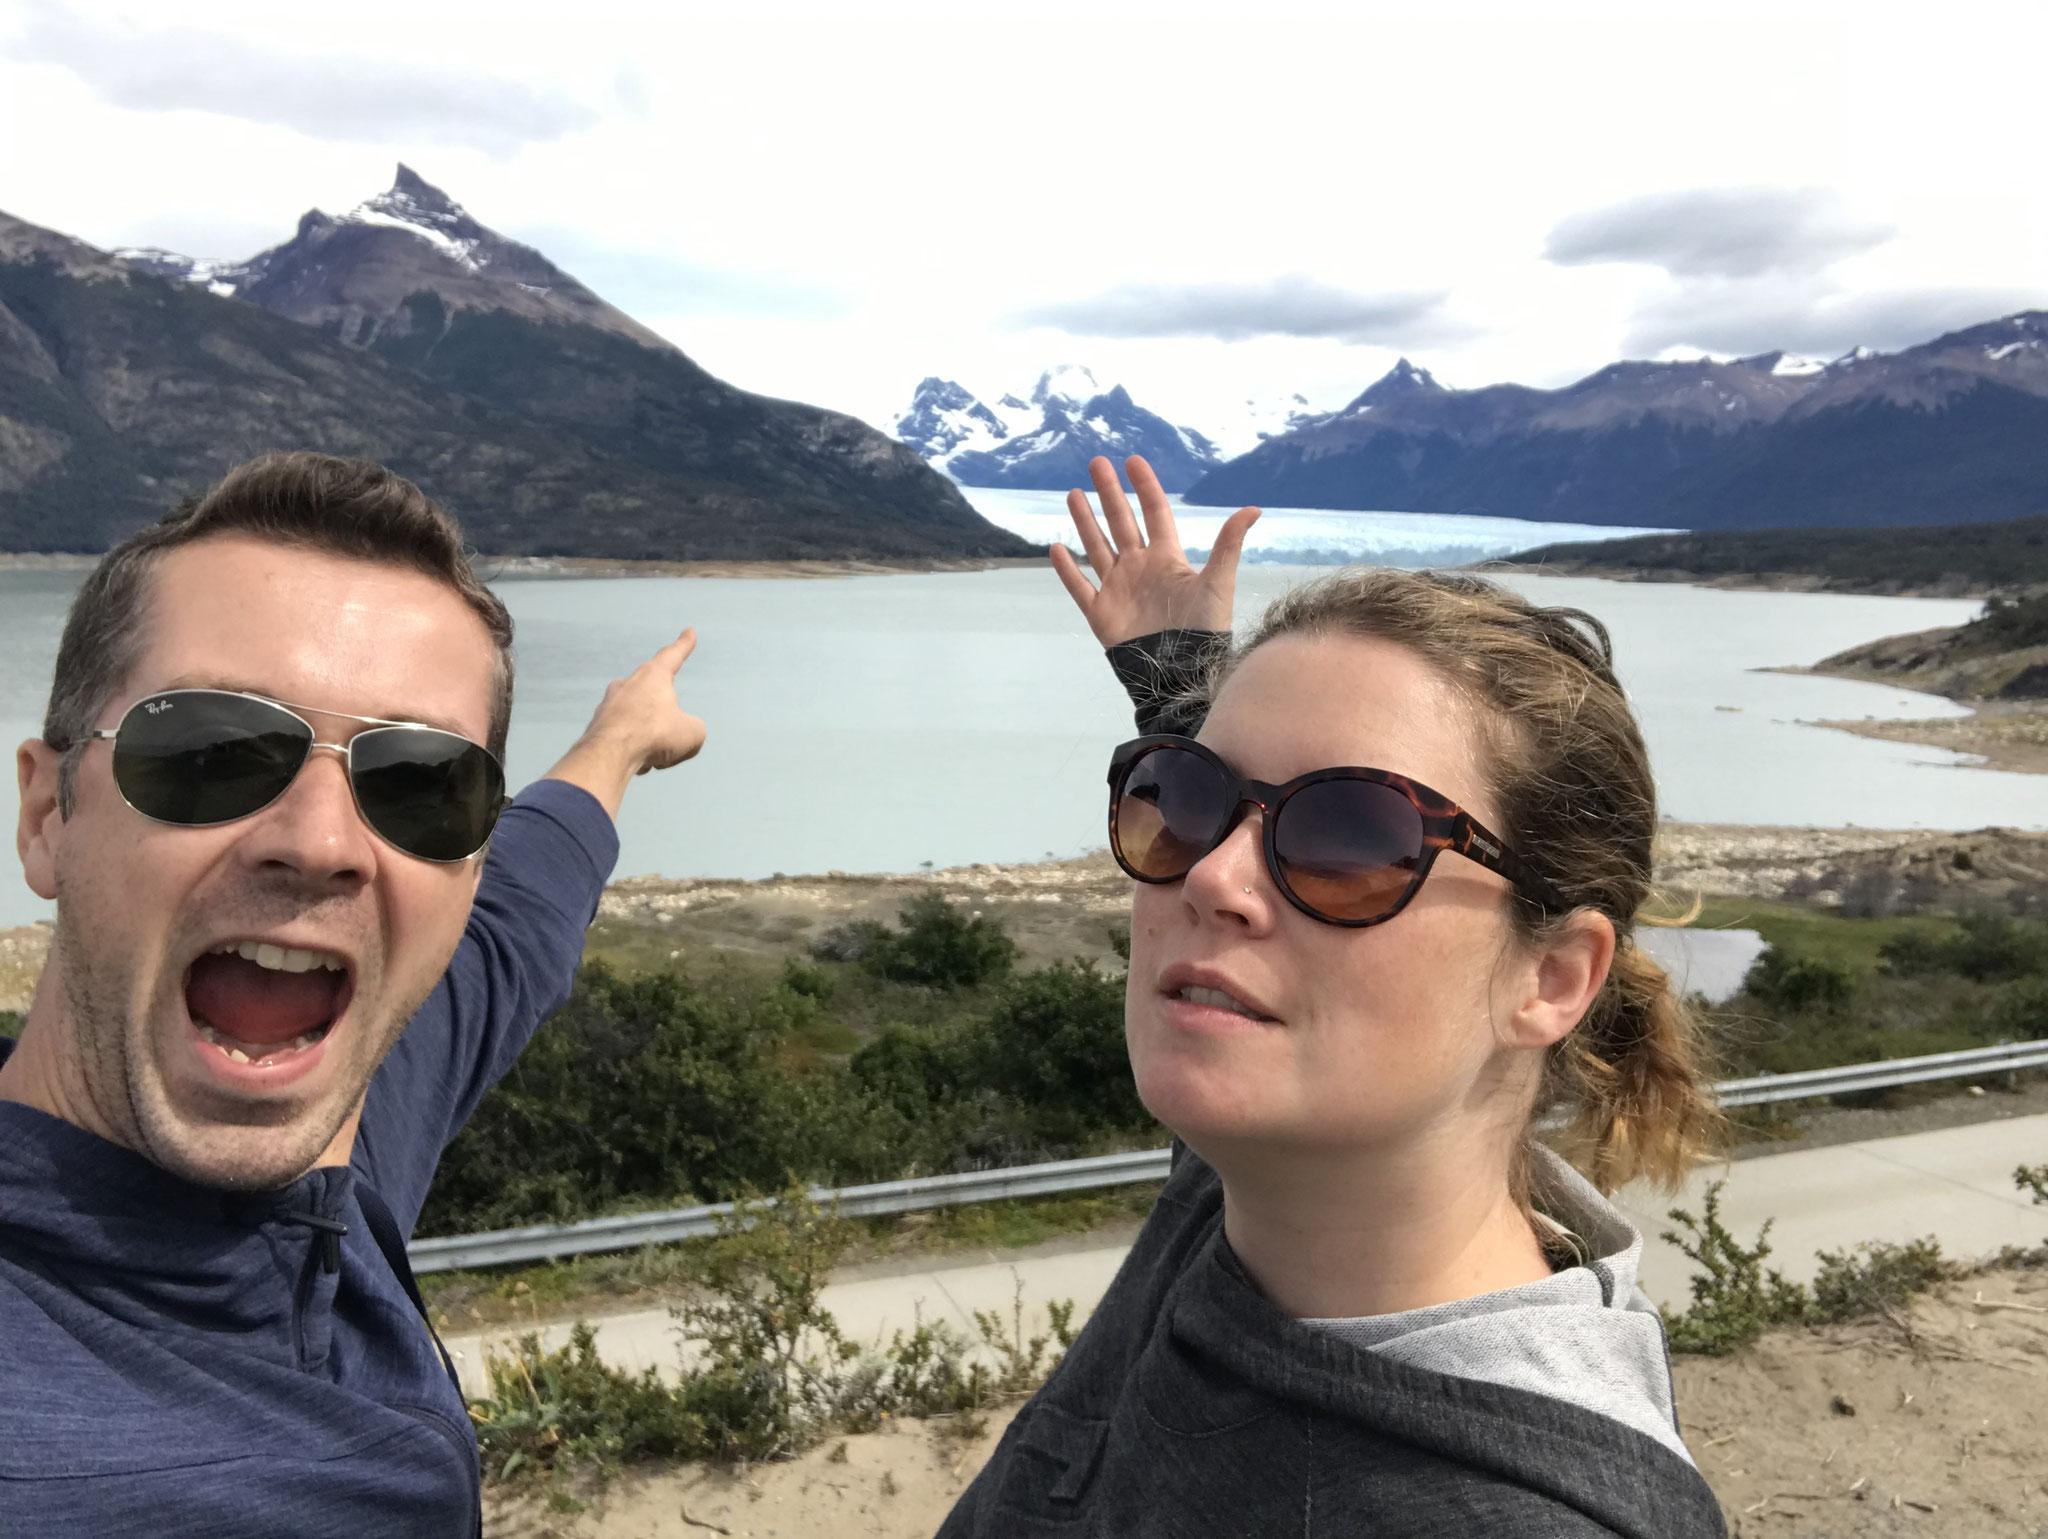 Erster Blick auf den Gletscher Perito Moreno